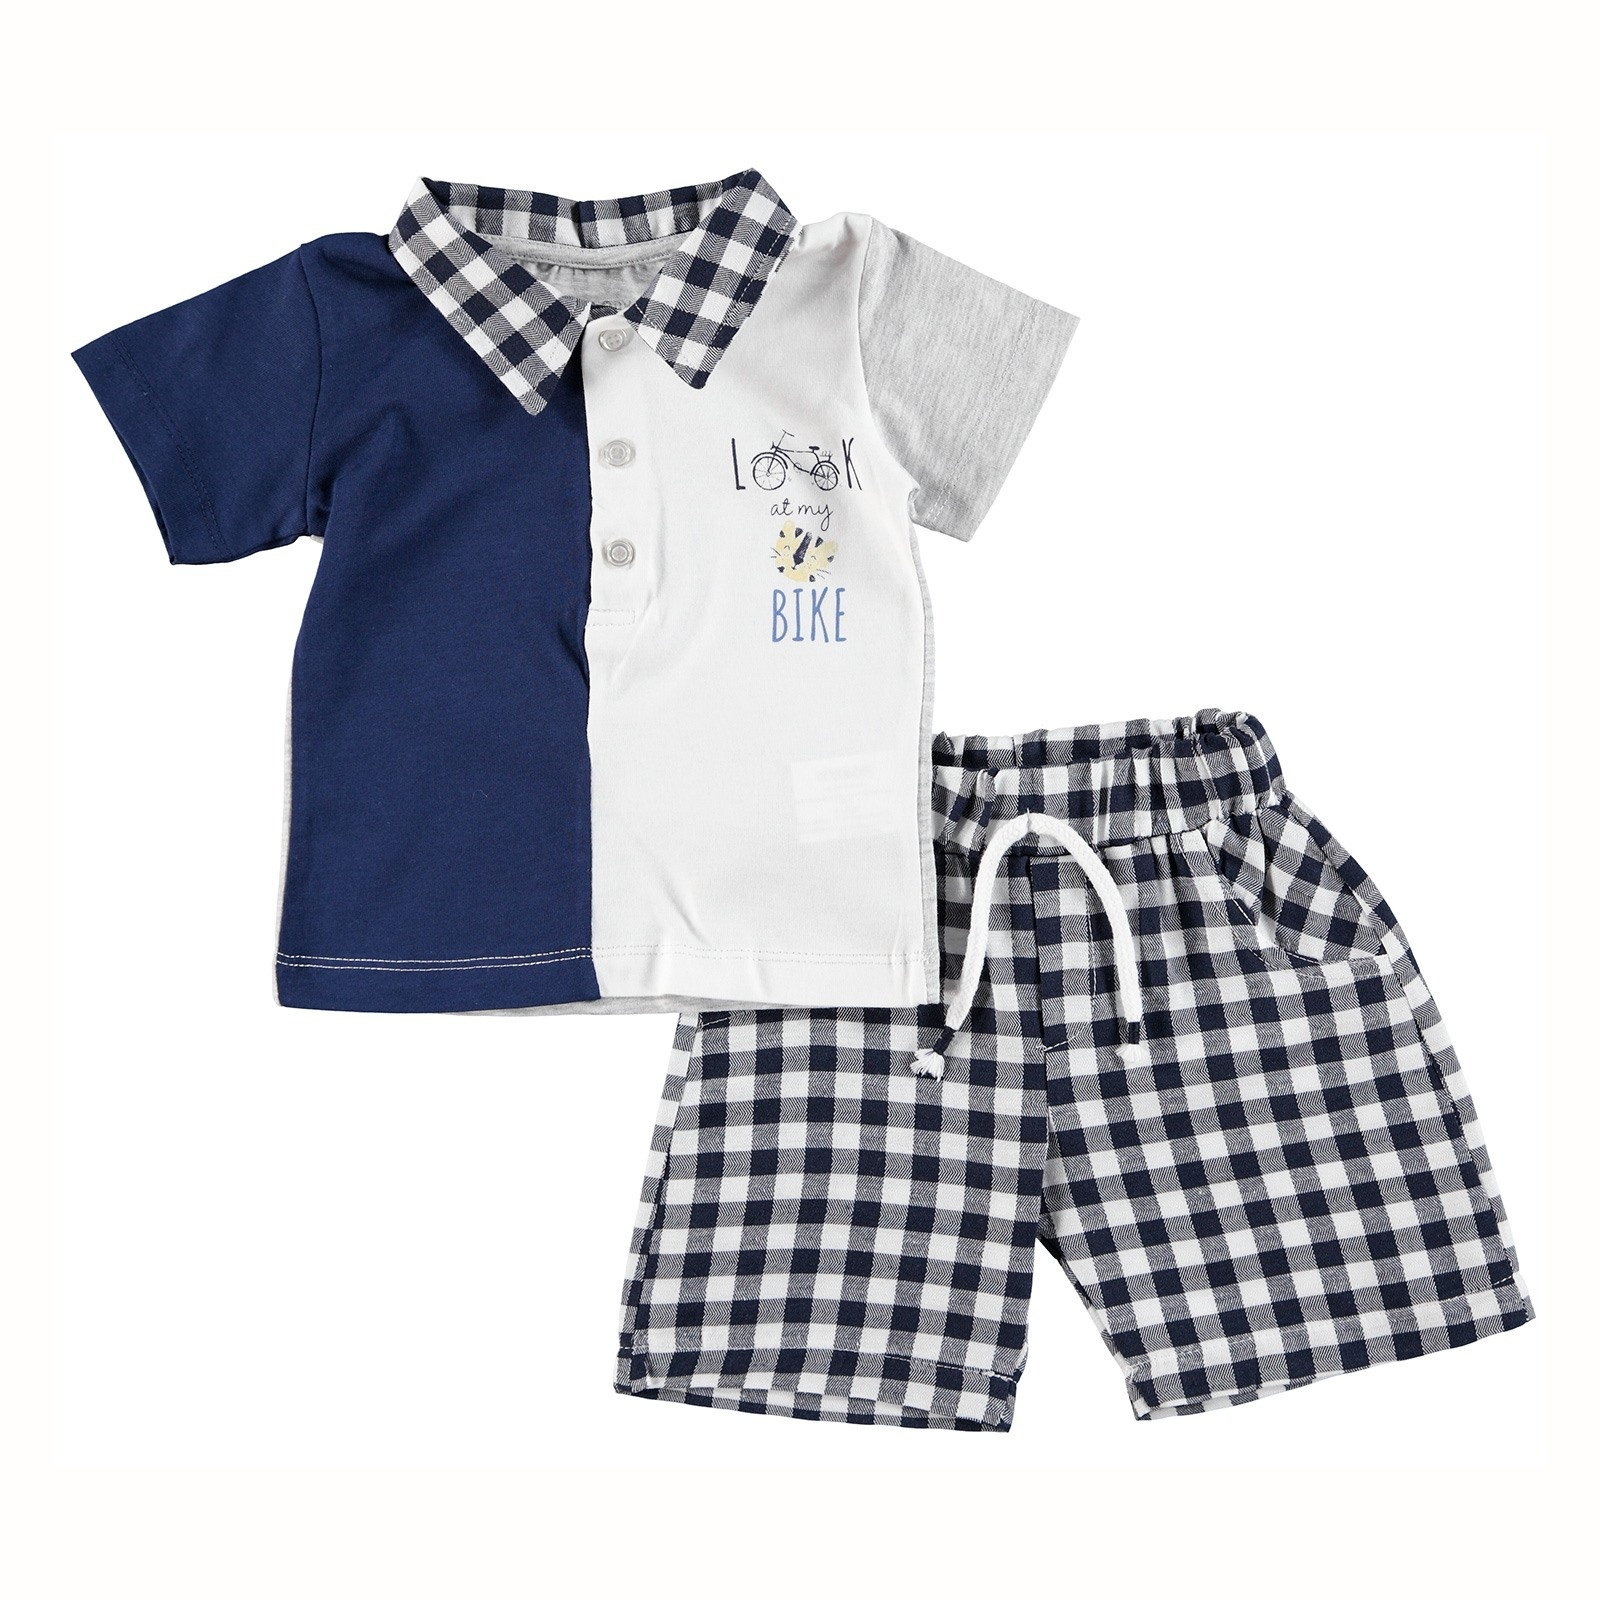 Ebebek HelloBaby Baby Boy Bike Theme Polo Neck Tshirt Short Set